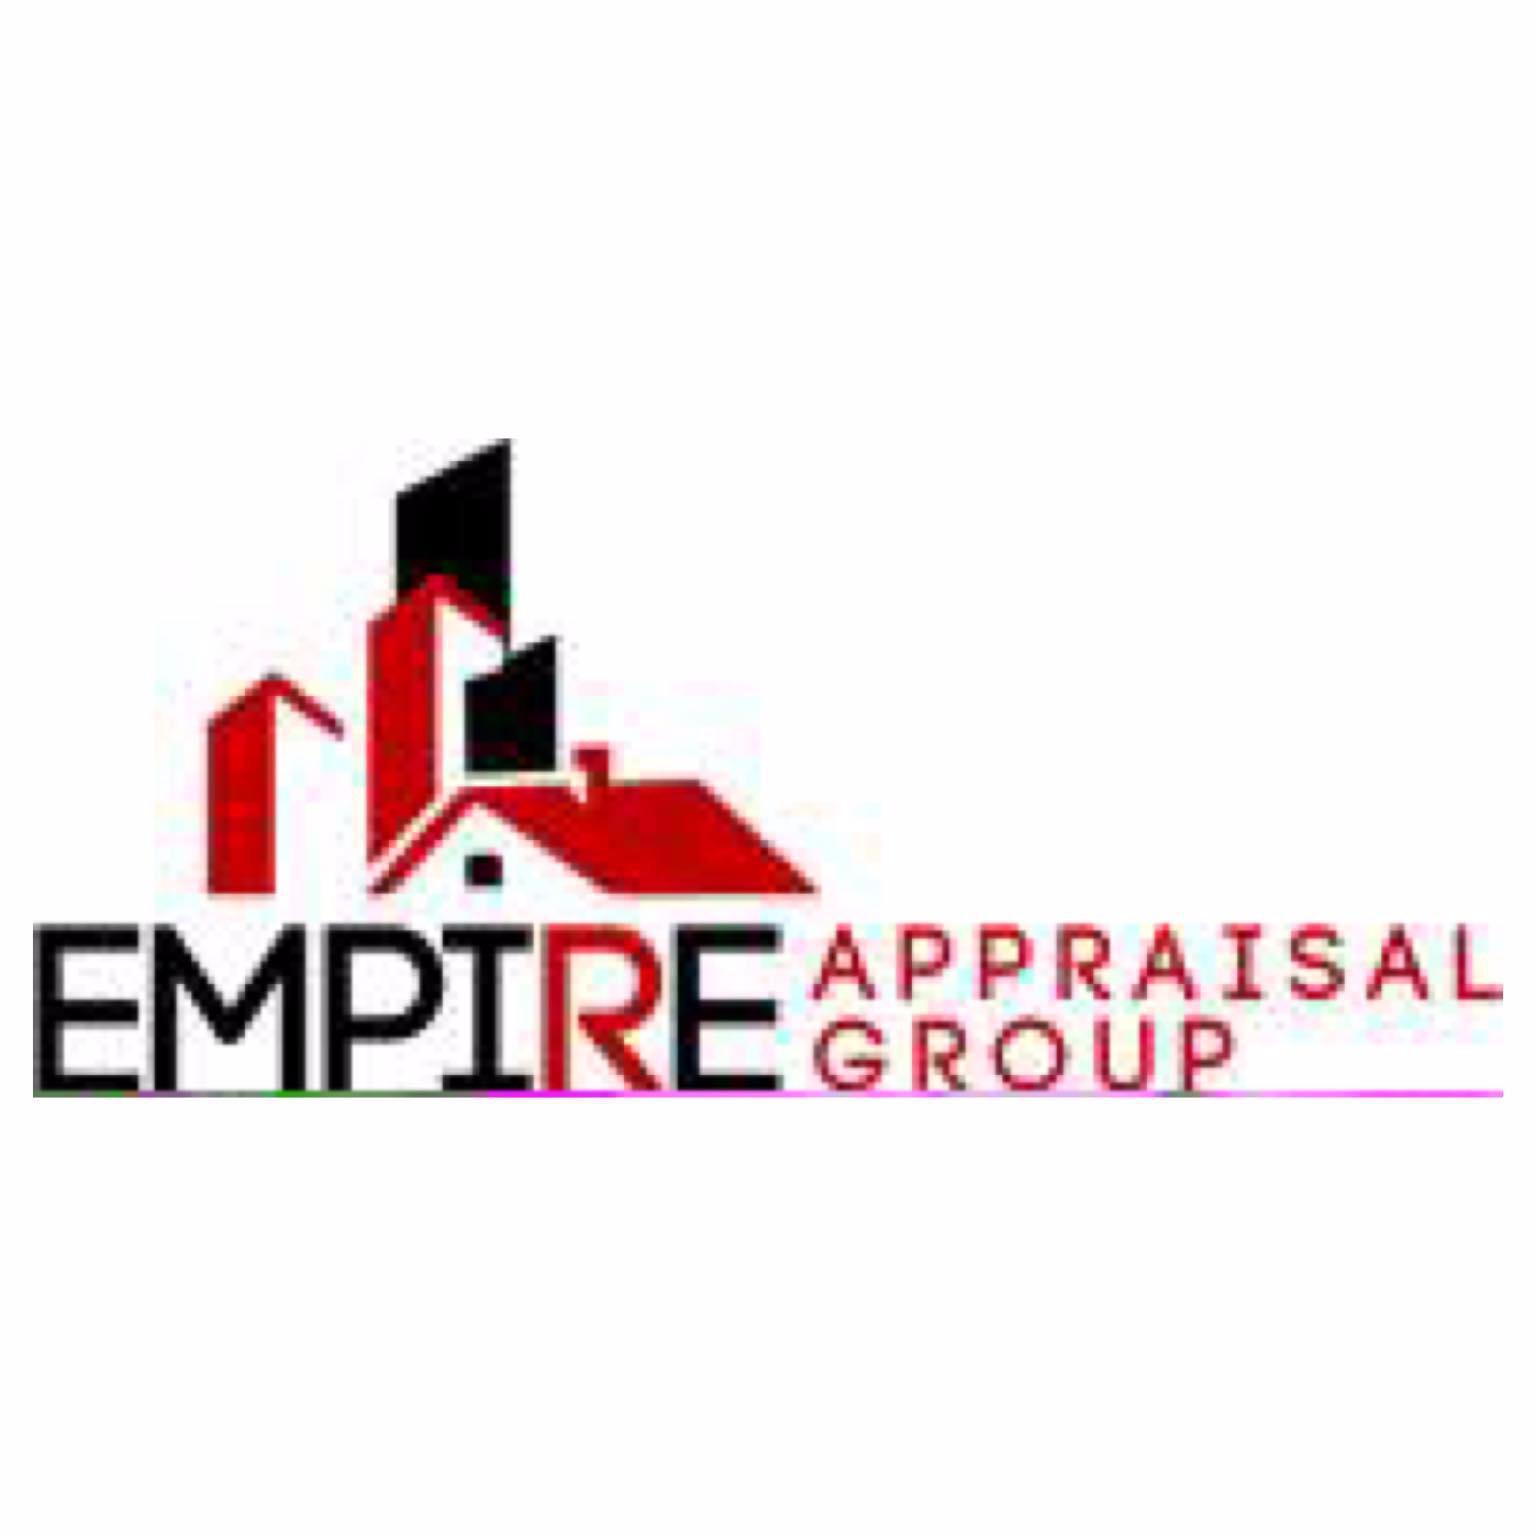 Empire Appraisals Inc.